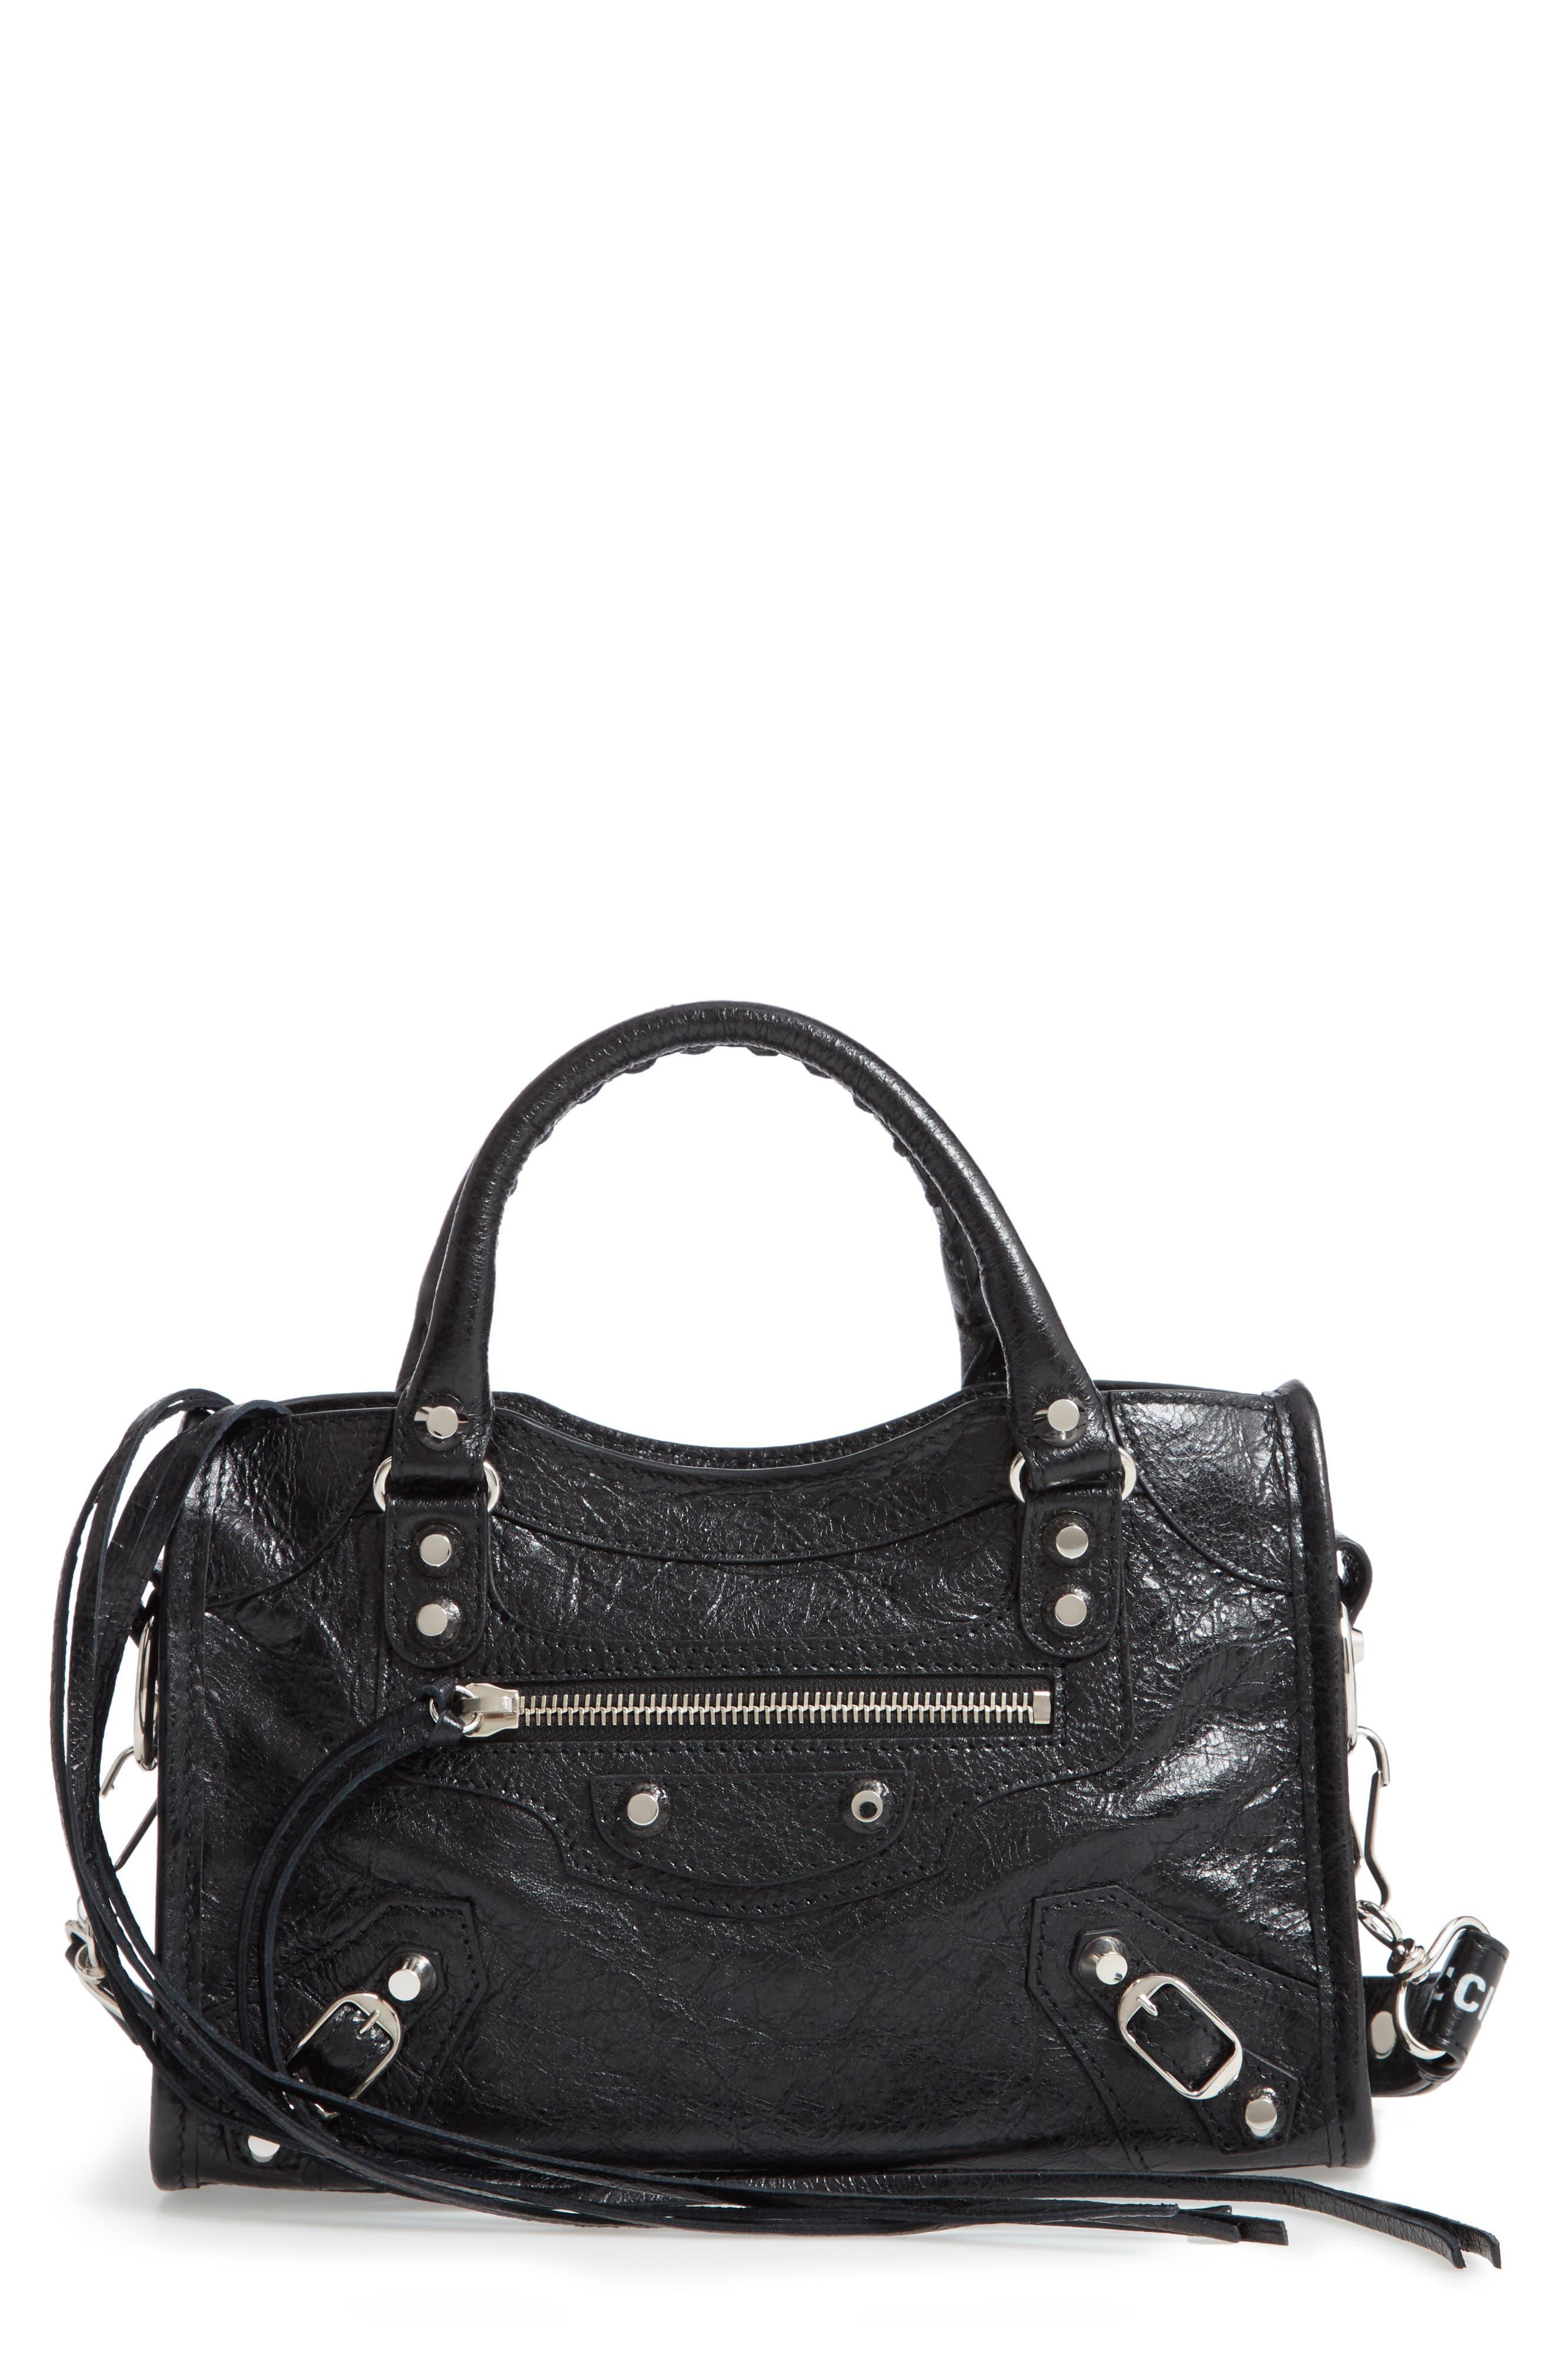 Mini Arena City Leather Satchel,                             Main thumbnail 1, color,                             BLACK/ WHITE